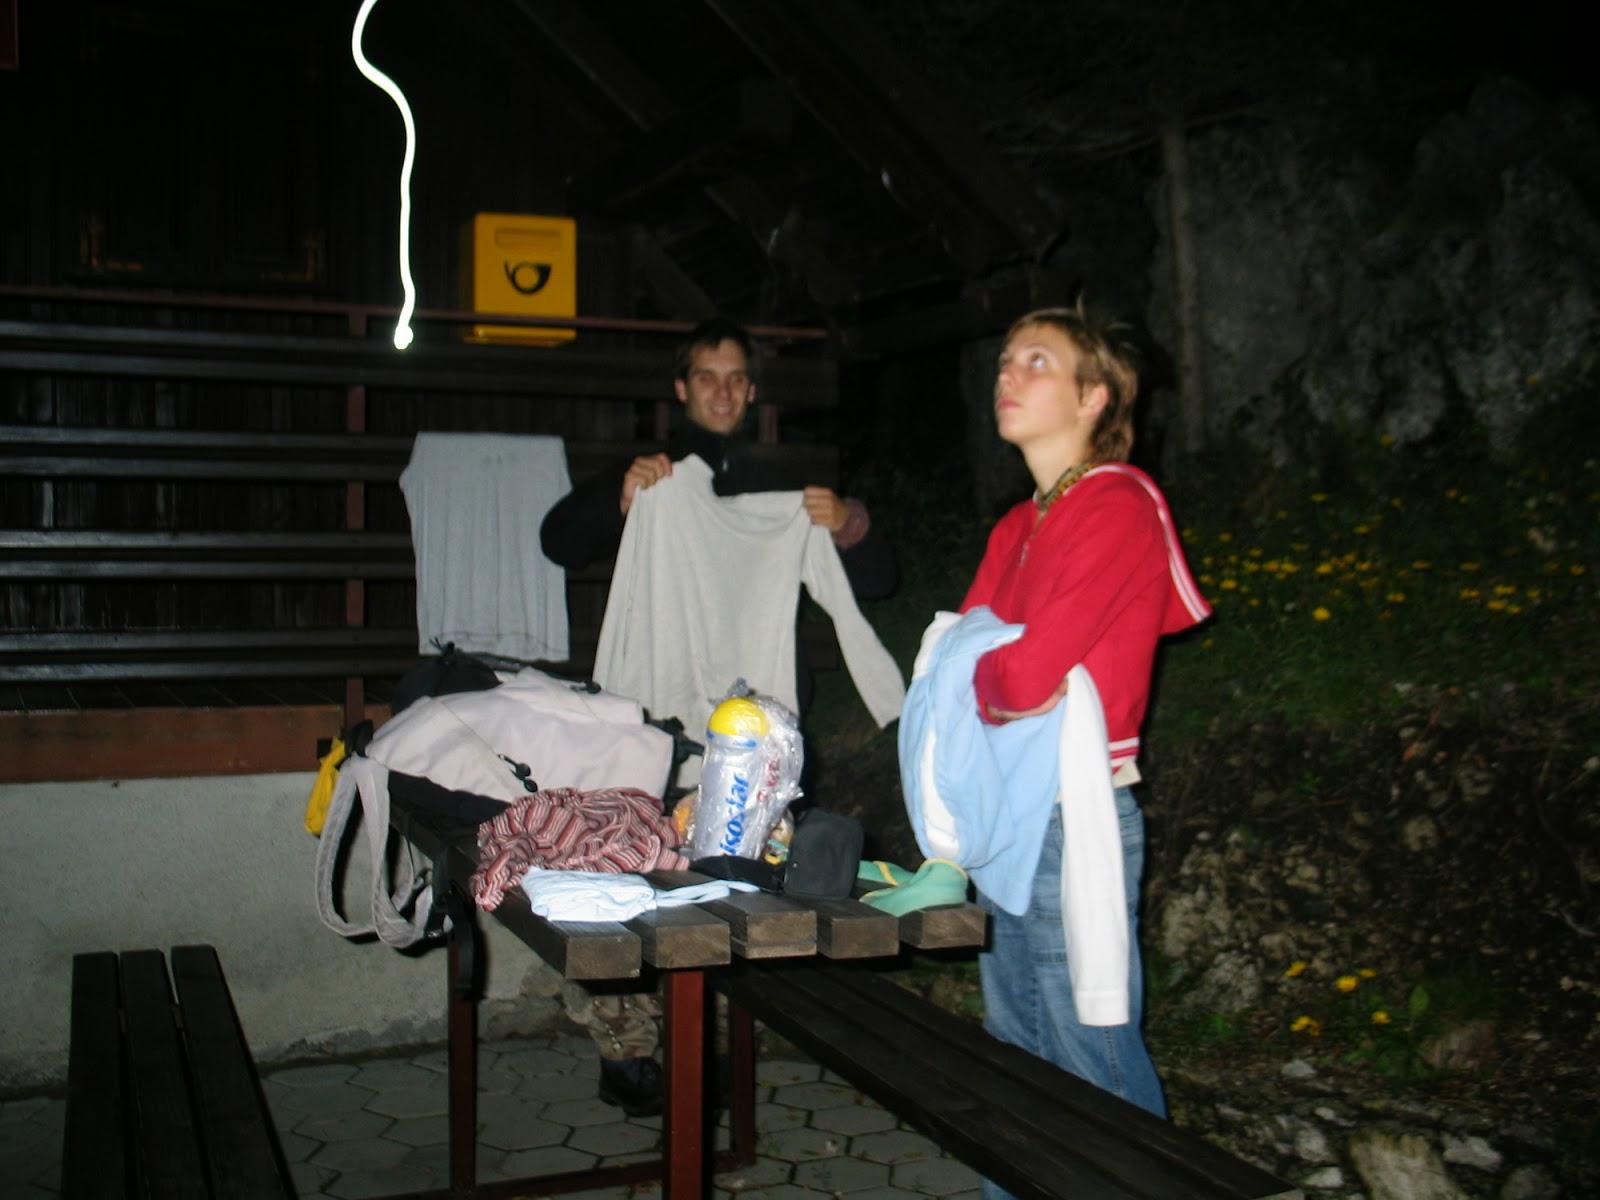 Kwzlek, Kozlek 2005 - Kwzlek%2B%25283%2529.jpg